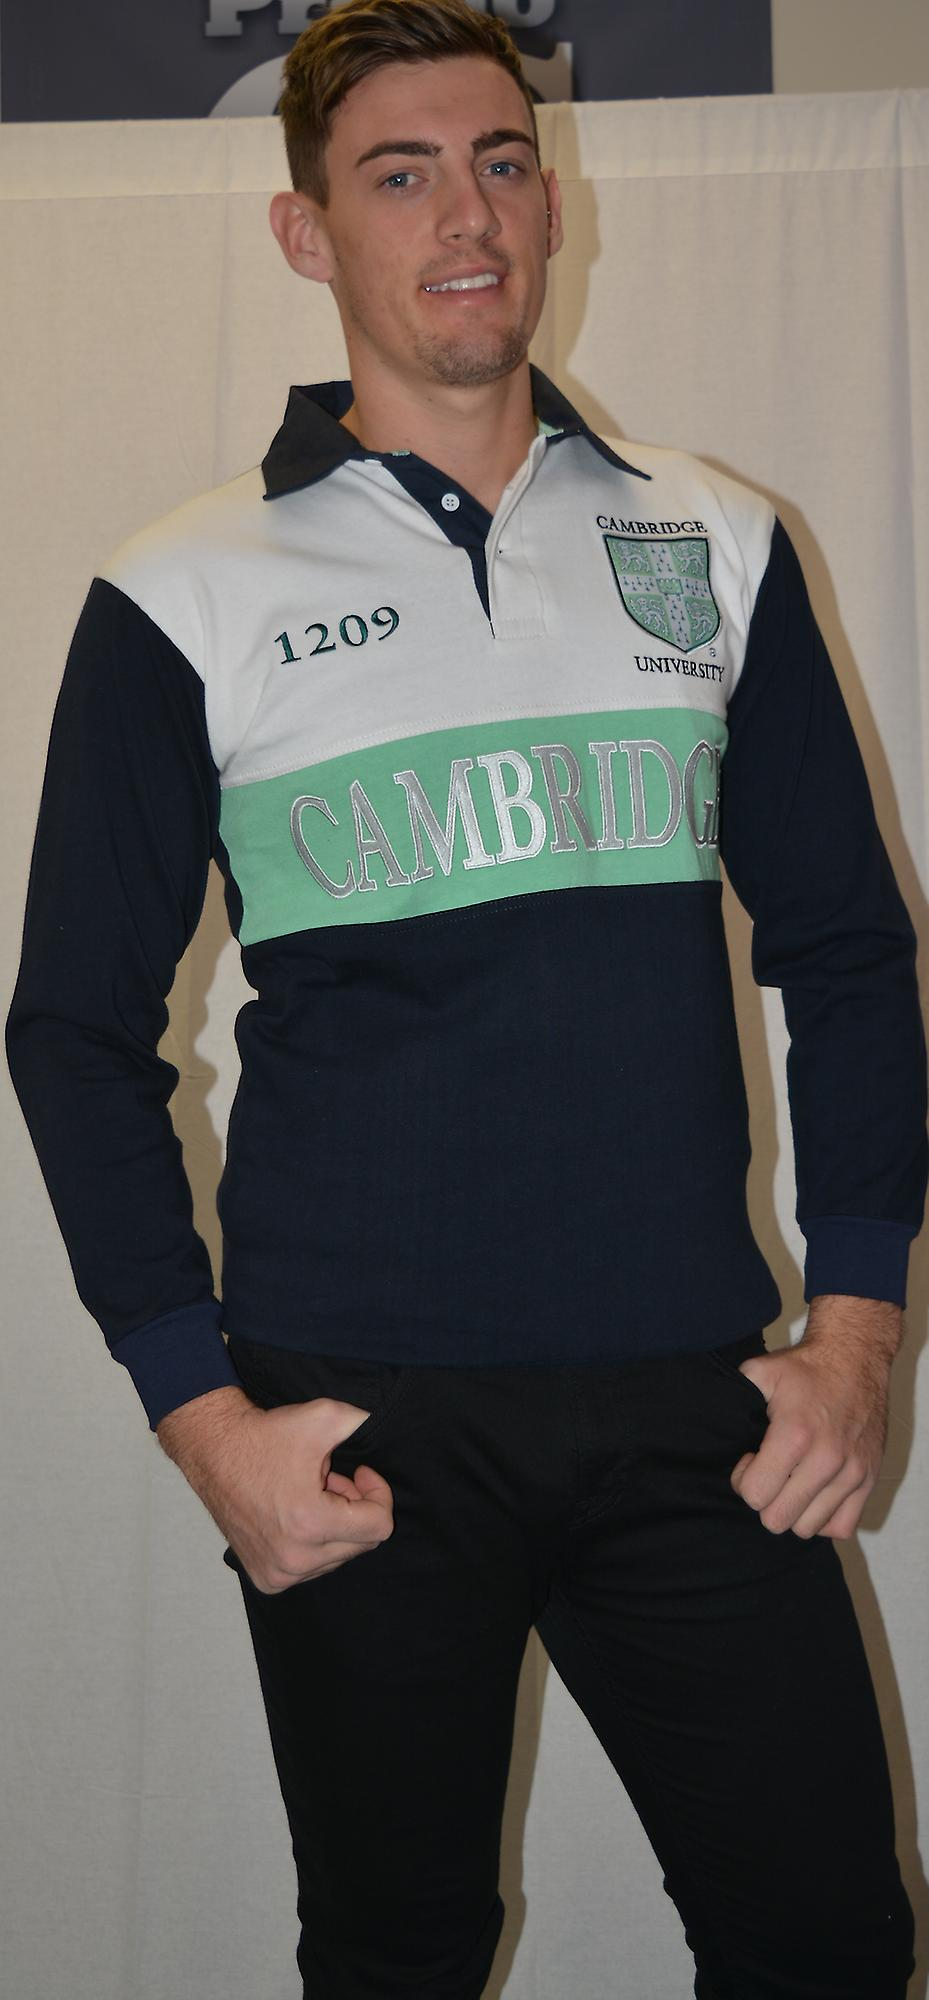 Licensed cambridge university™ unisex rugby shirt